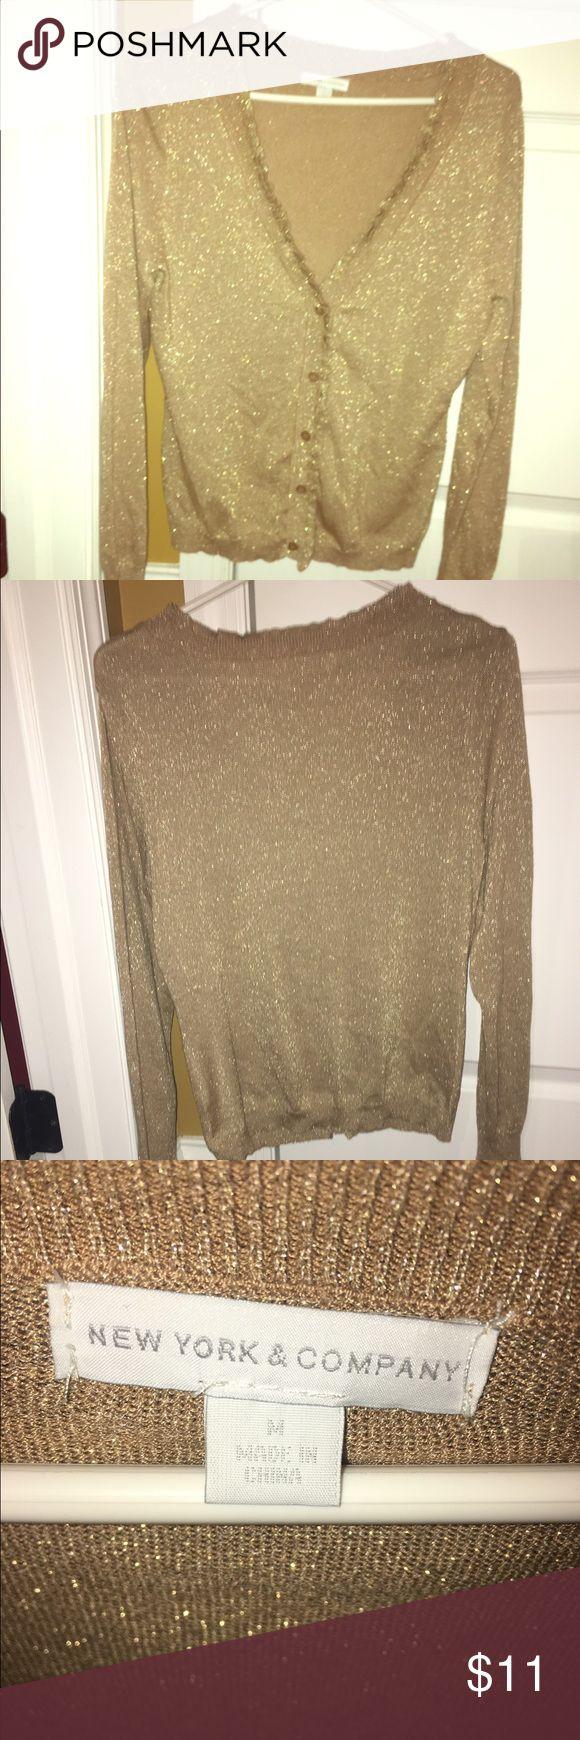 Gold cardigan sweater Gold cardigan sweater Sweaters